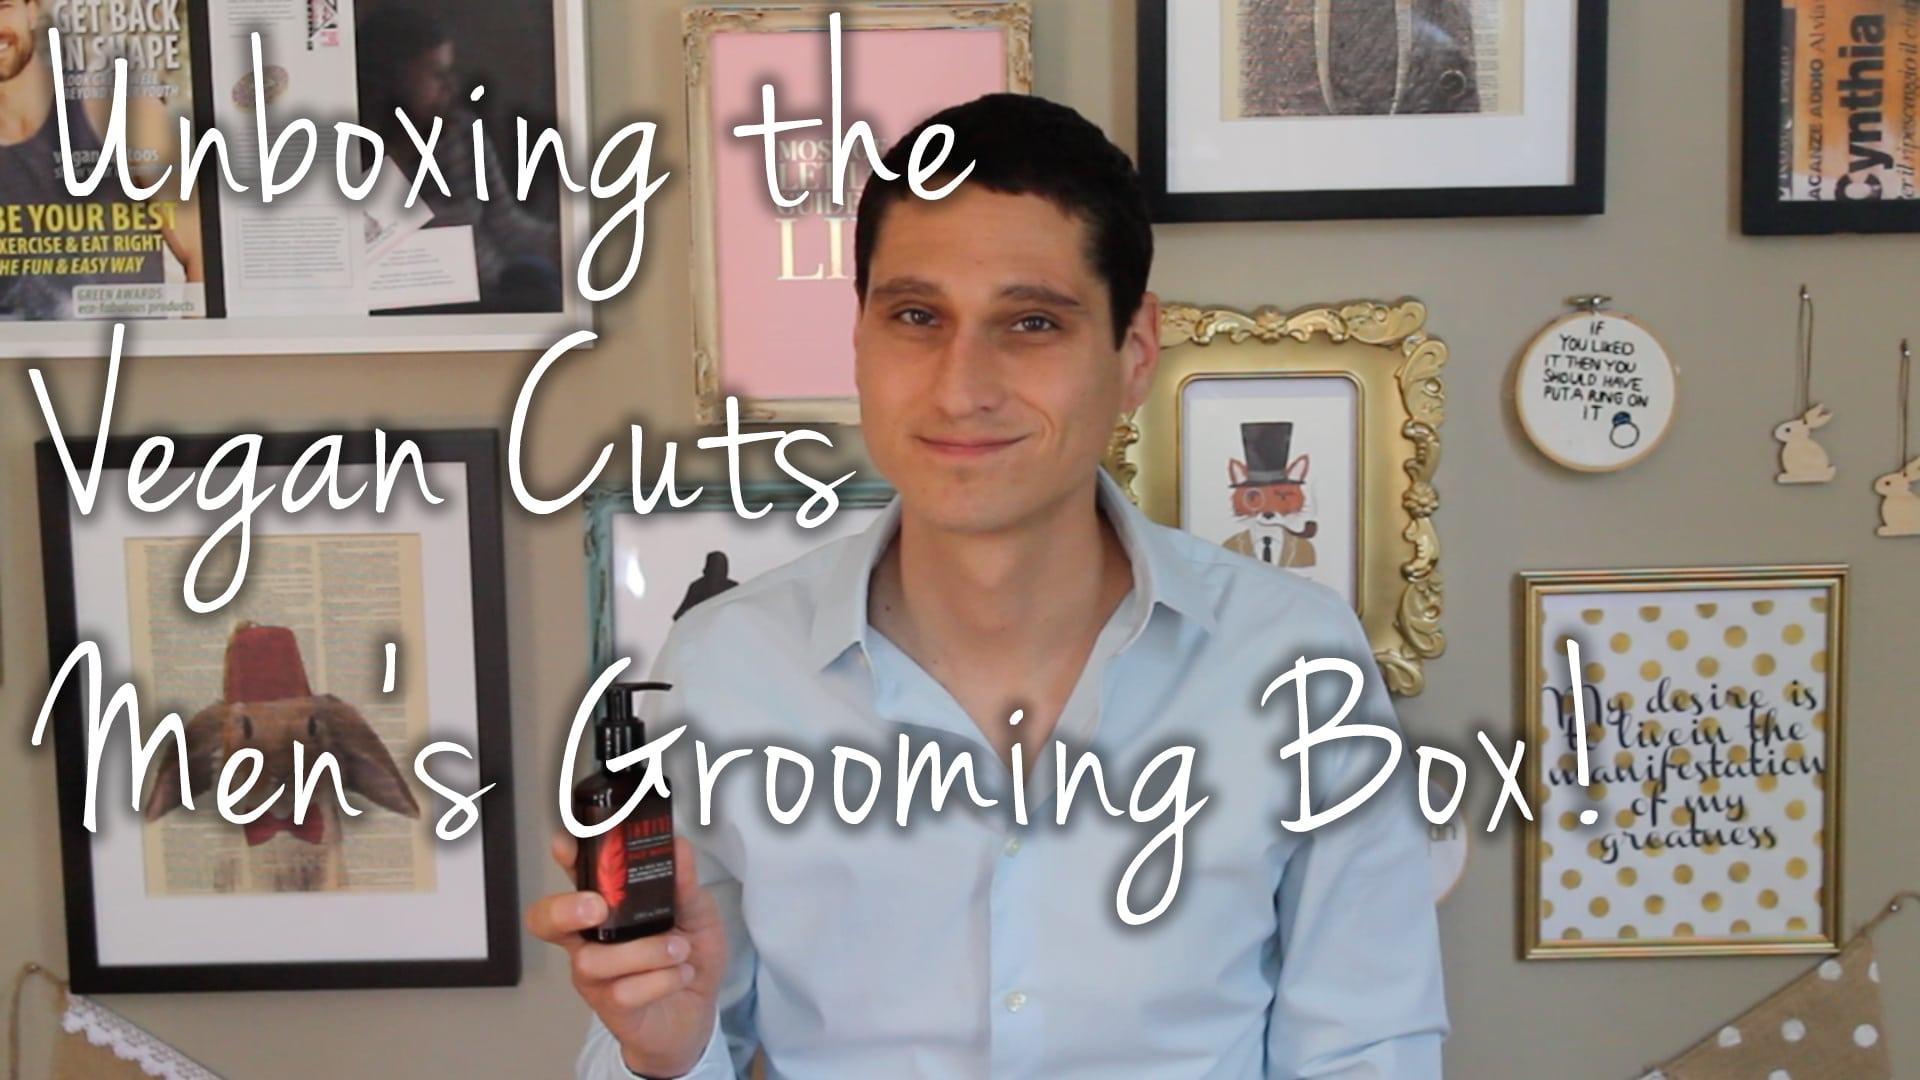 Vegan Cuts Men's Grooming Box First Impressions VideoVegan Cuts Men's Grooming Box First Impressions Video